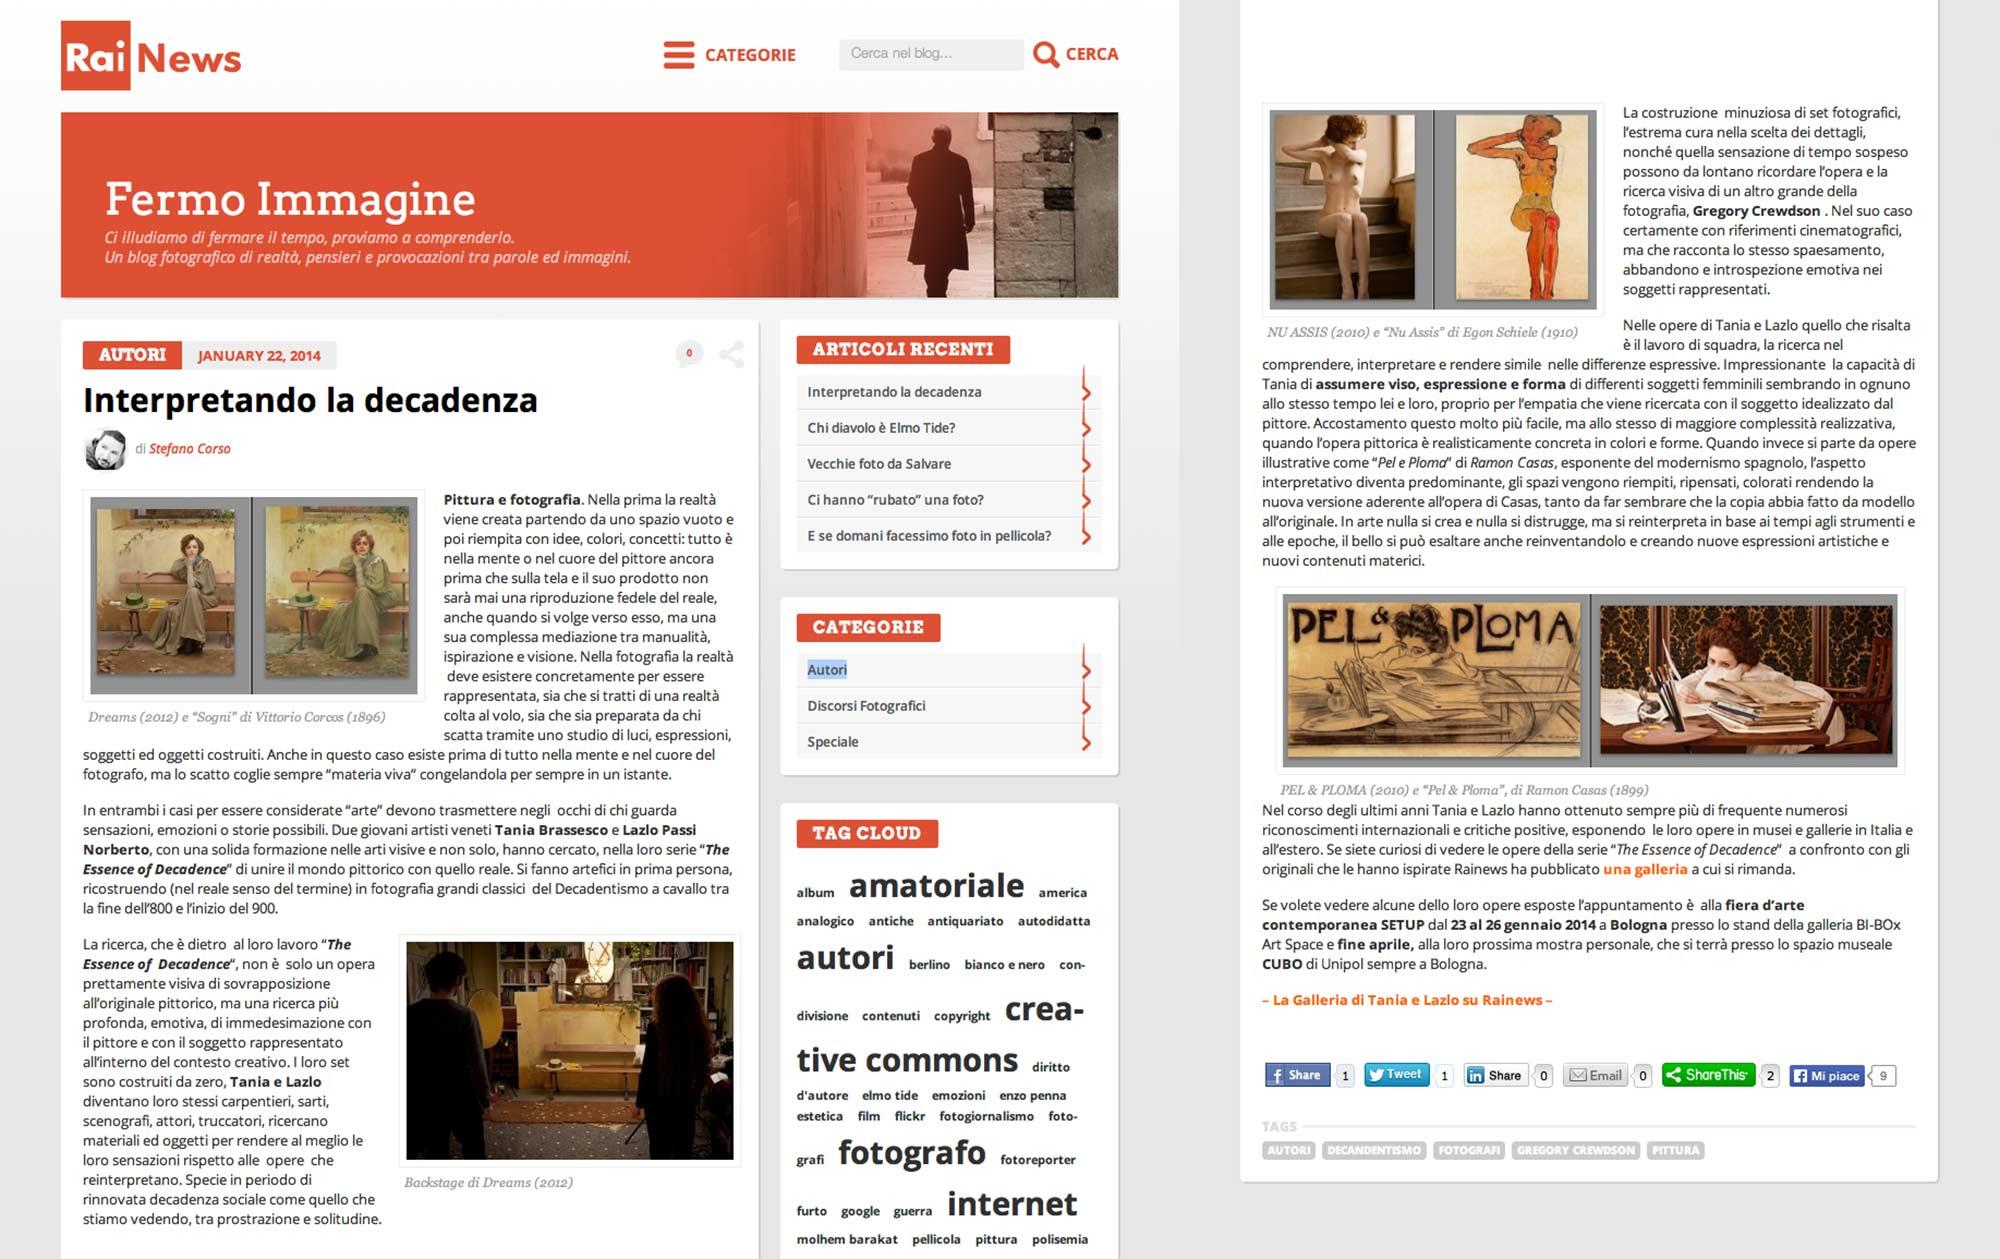 Tania-and-Lazlo-on-Rai-News.jpg